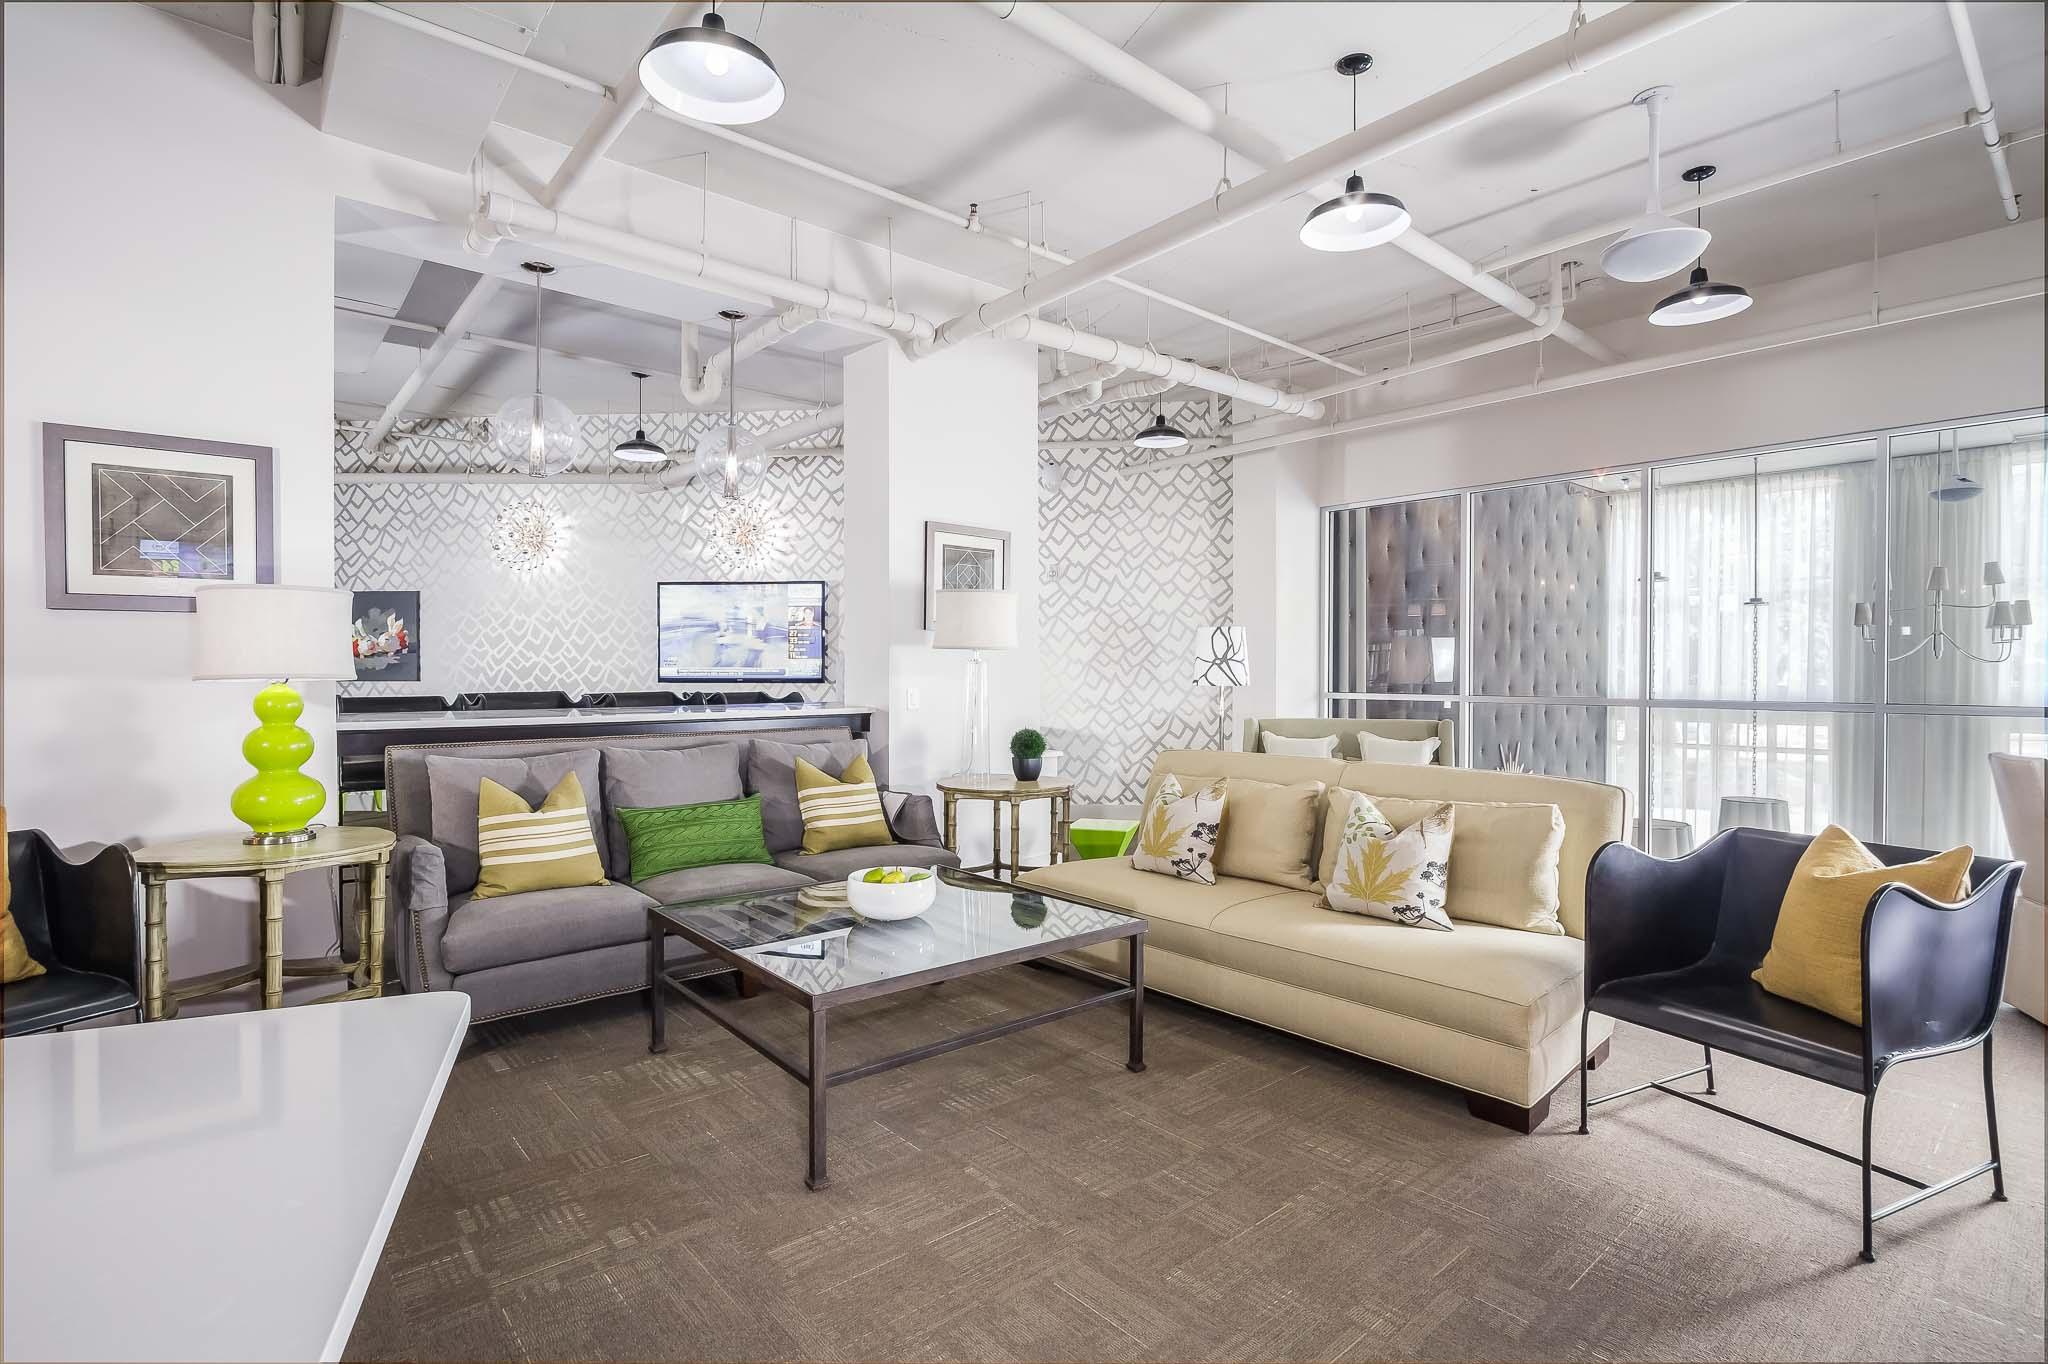 39-gameroom-lounge-feature.jpg